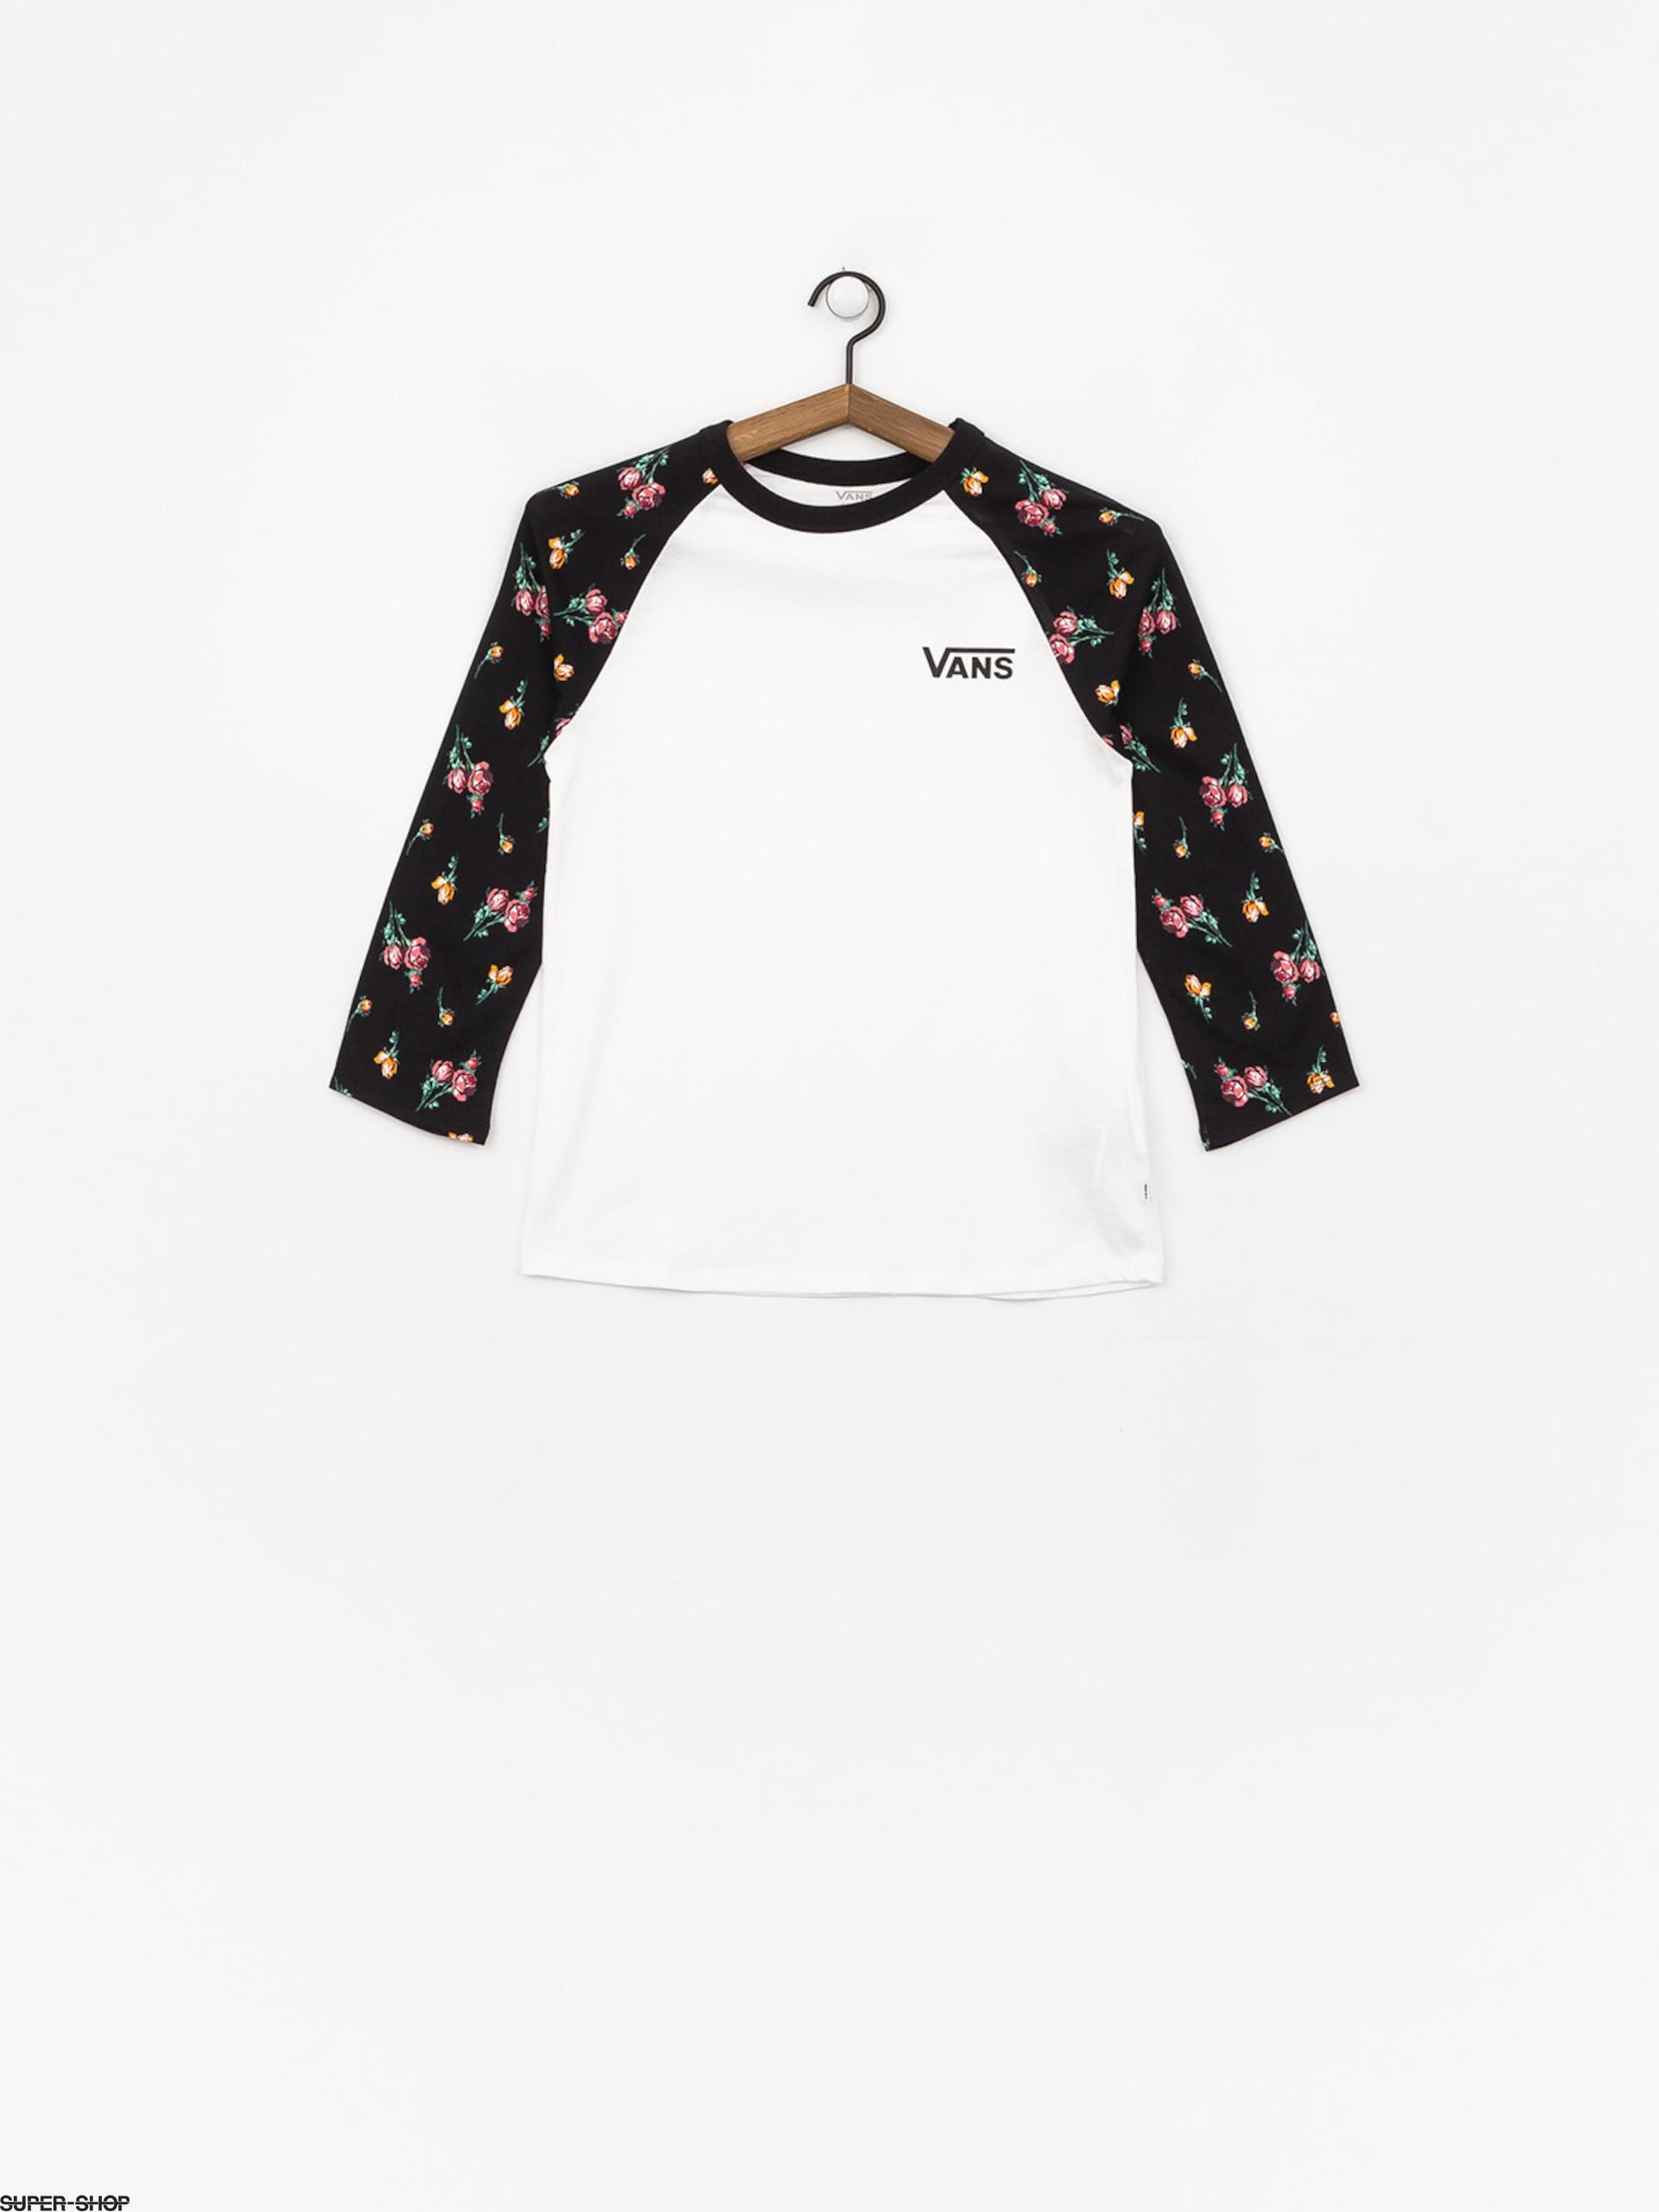 625fe140c3b Vans satin floral raglan shirt black satin florral jpg 1200x1600 Floral  vans shirt